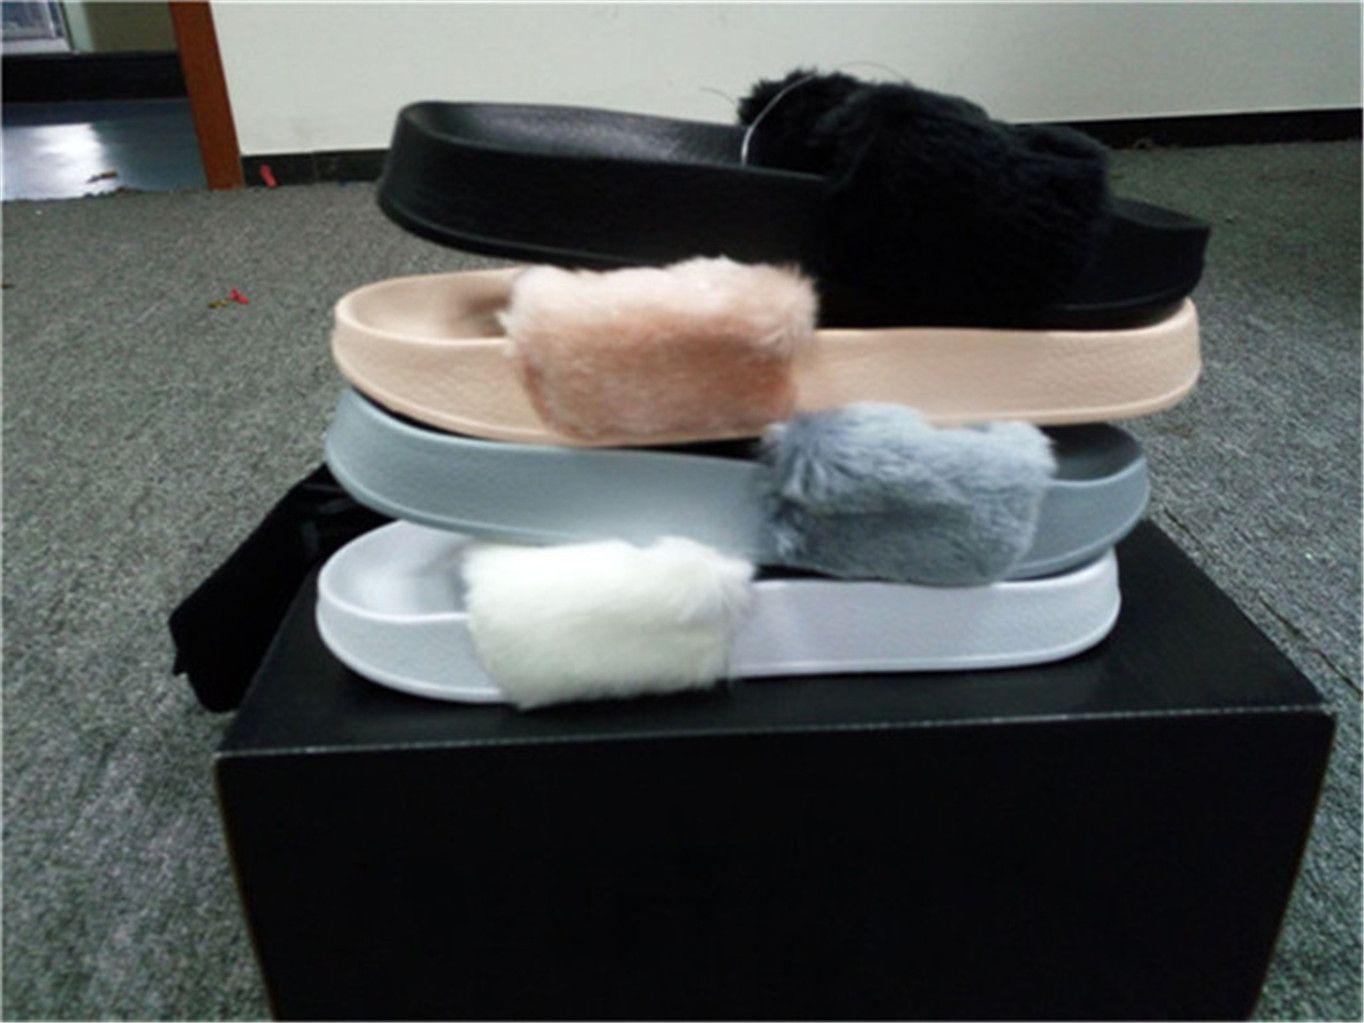 427beac6859 Dust Bags+ BoxRIHANNA FUR LEADCAT FENTY SLIDES WOMEN Men SLIPPERS House  Winter Slipper Home Shoes Woman Warm Slippers Chinelos Bag Designer Shoes  Brown ...